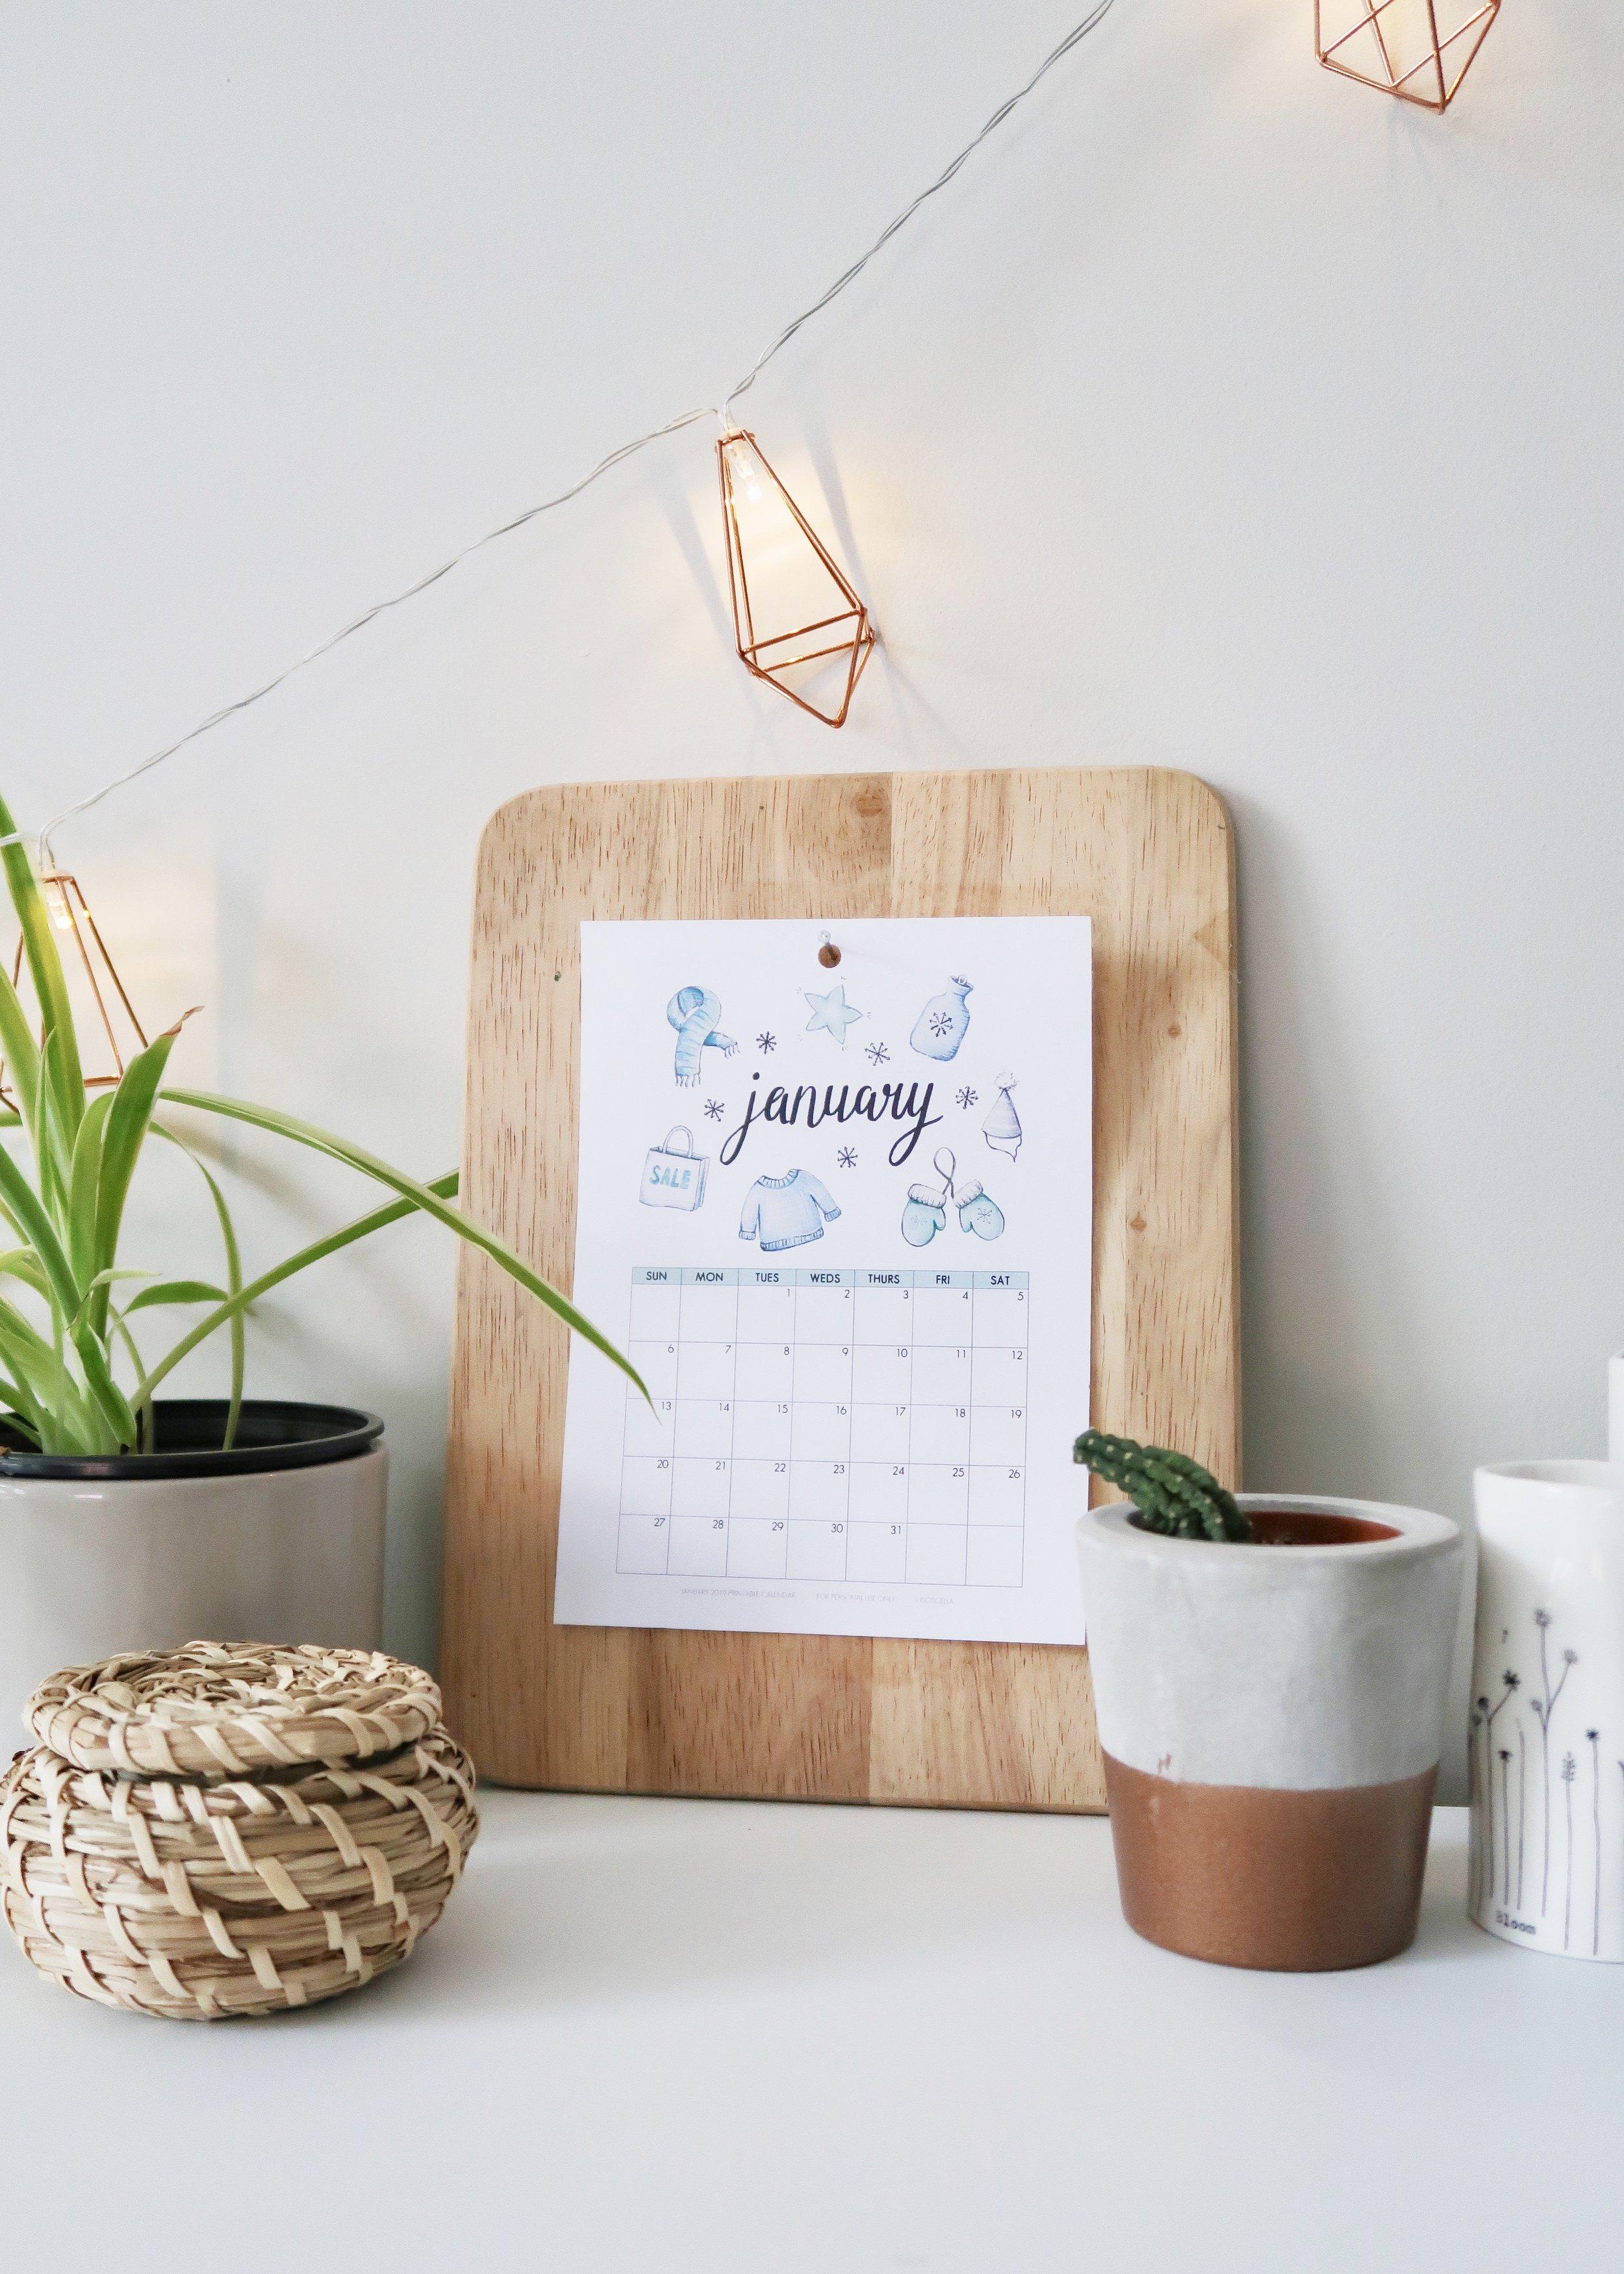 New Illustrated January 2019 Calendar (+ Free Printable) by Isoscella